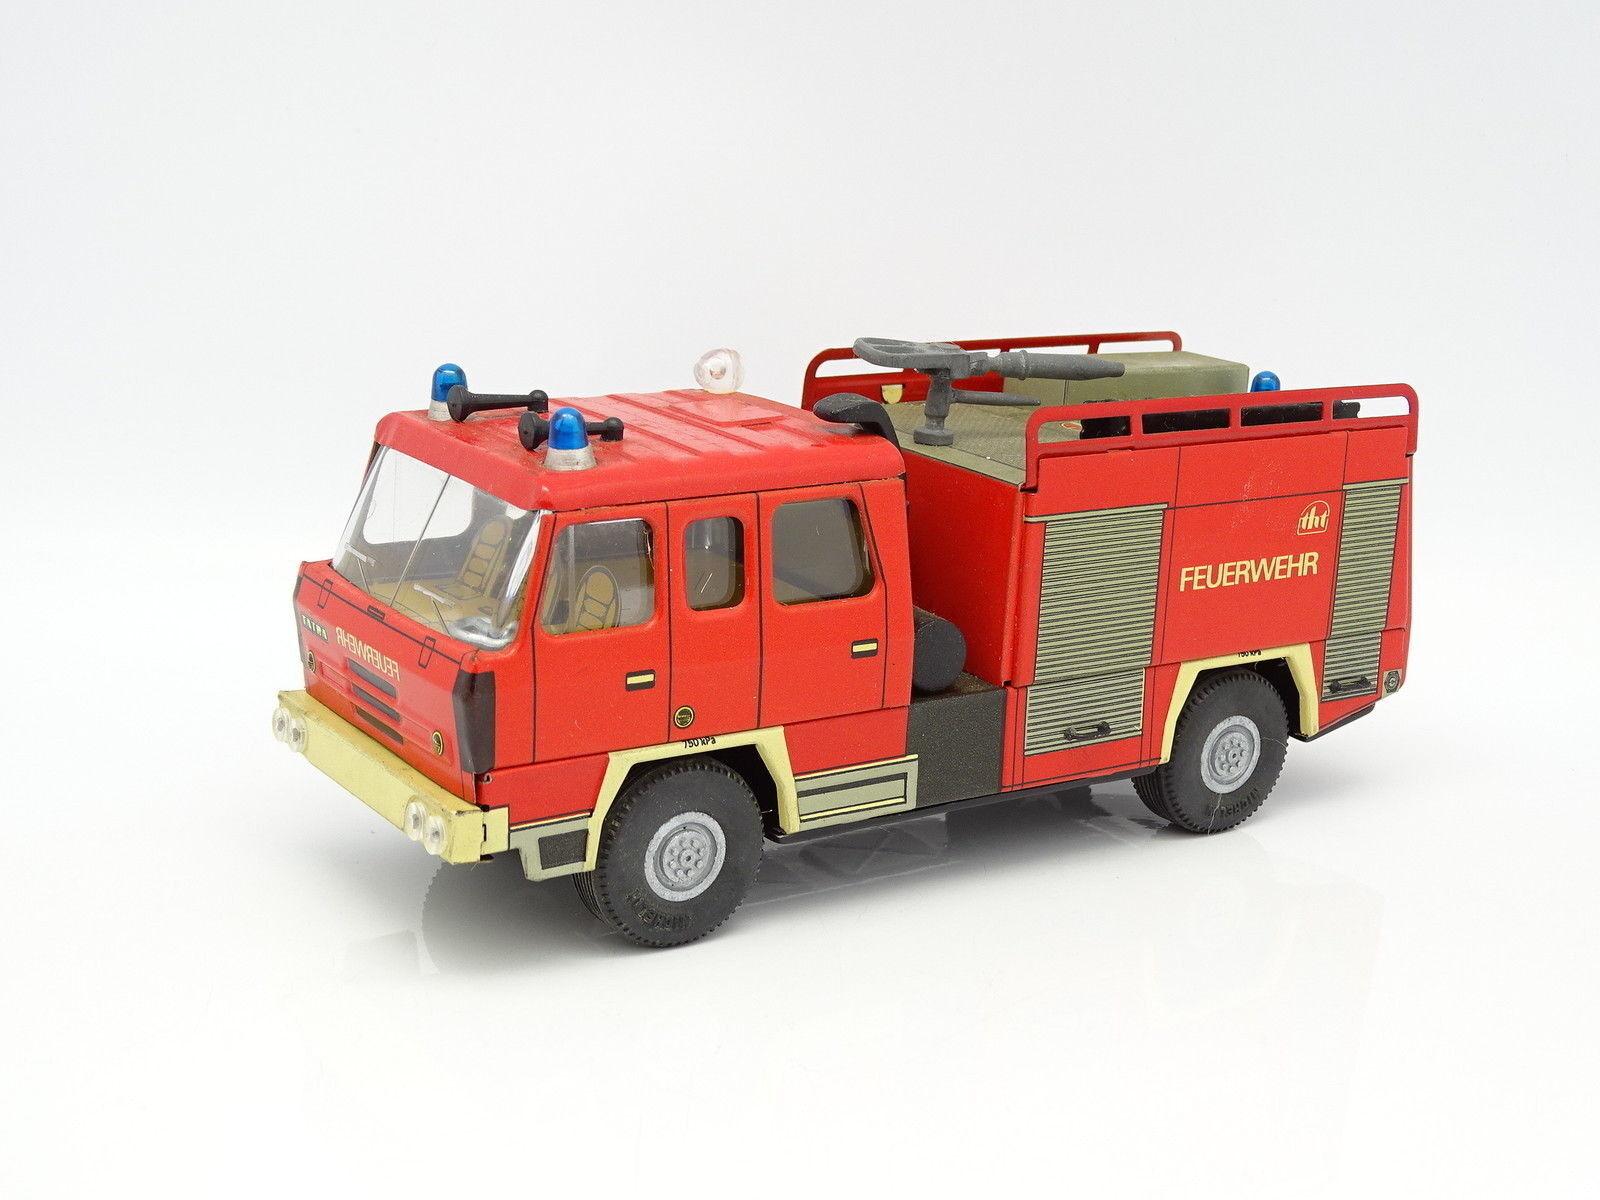 negozio all'ingrosso Kovap 1 43 - Tatra 815 THT Feuerwehr Pompiers Pompiers Pompiers  conveniente